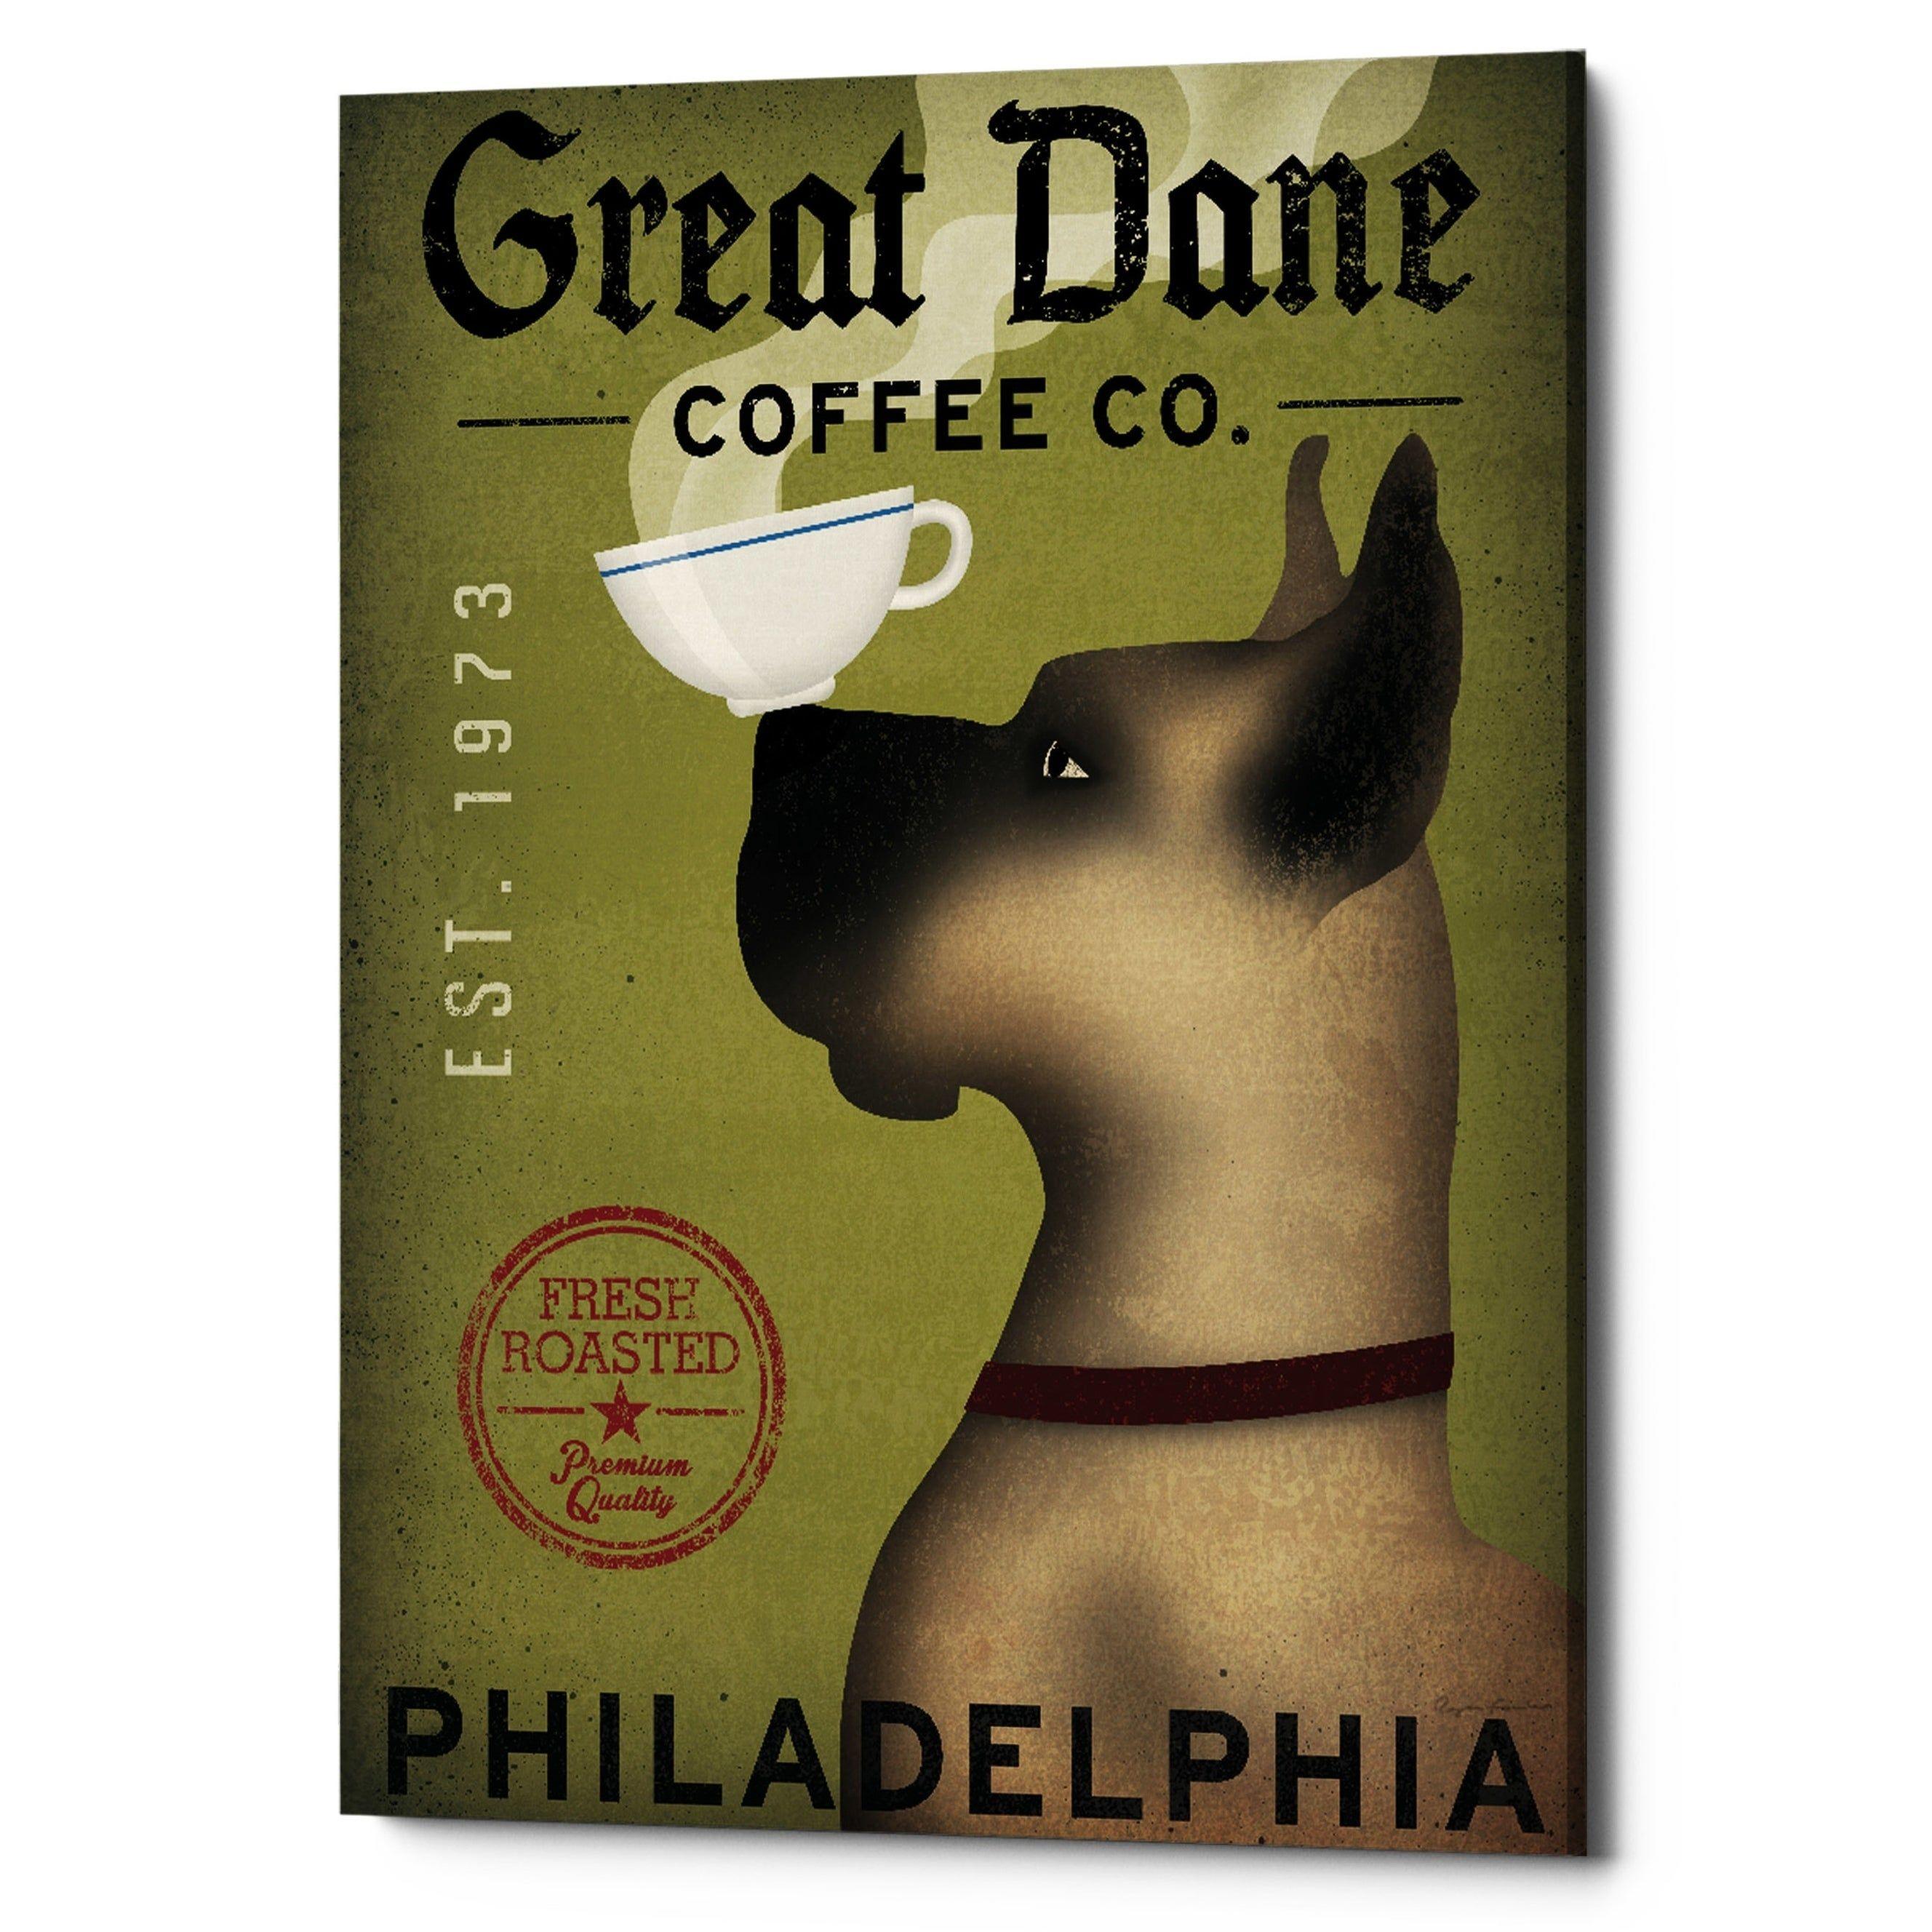 Epic Graffiti Great Dane Coffee Philadelphia By Ryan Fowler